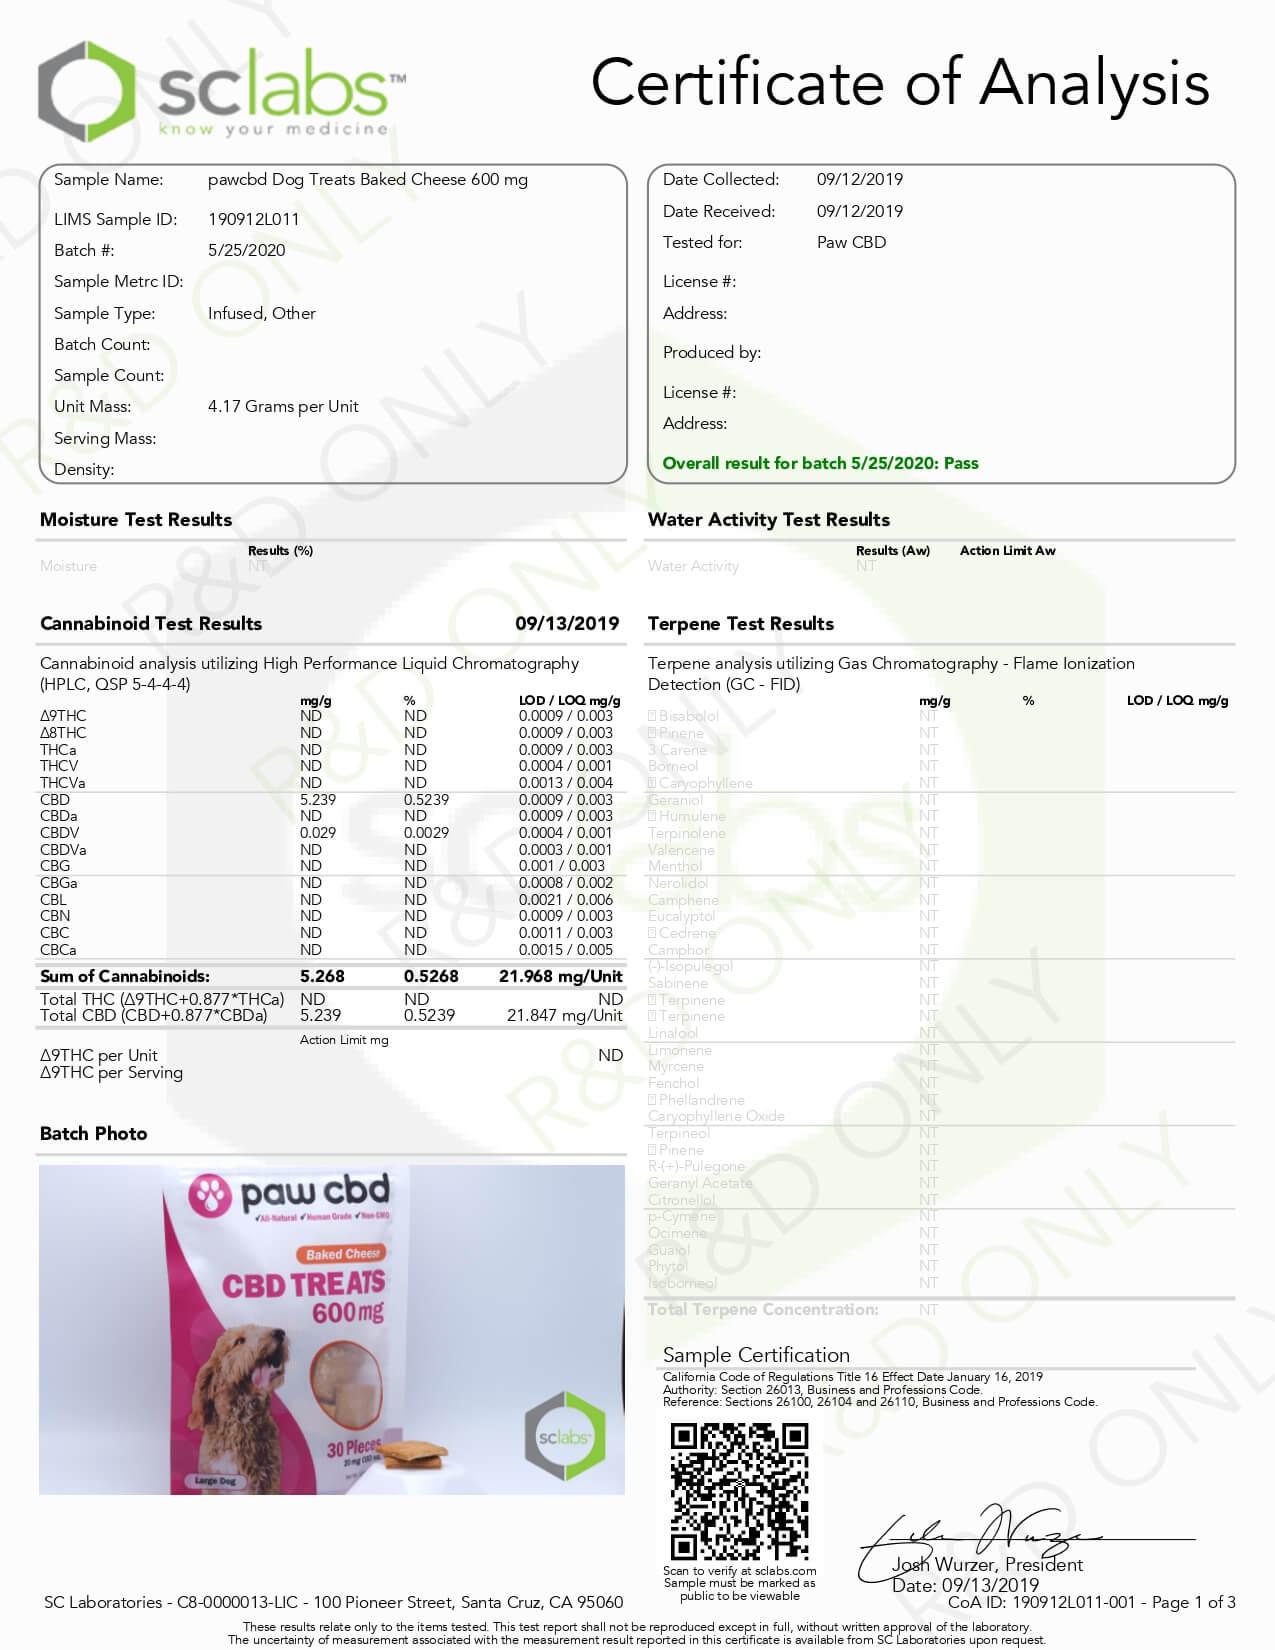 cbdMD CBD Pet Edible Baked Cheese Dog Treats 600mg Lab Report